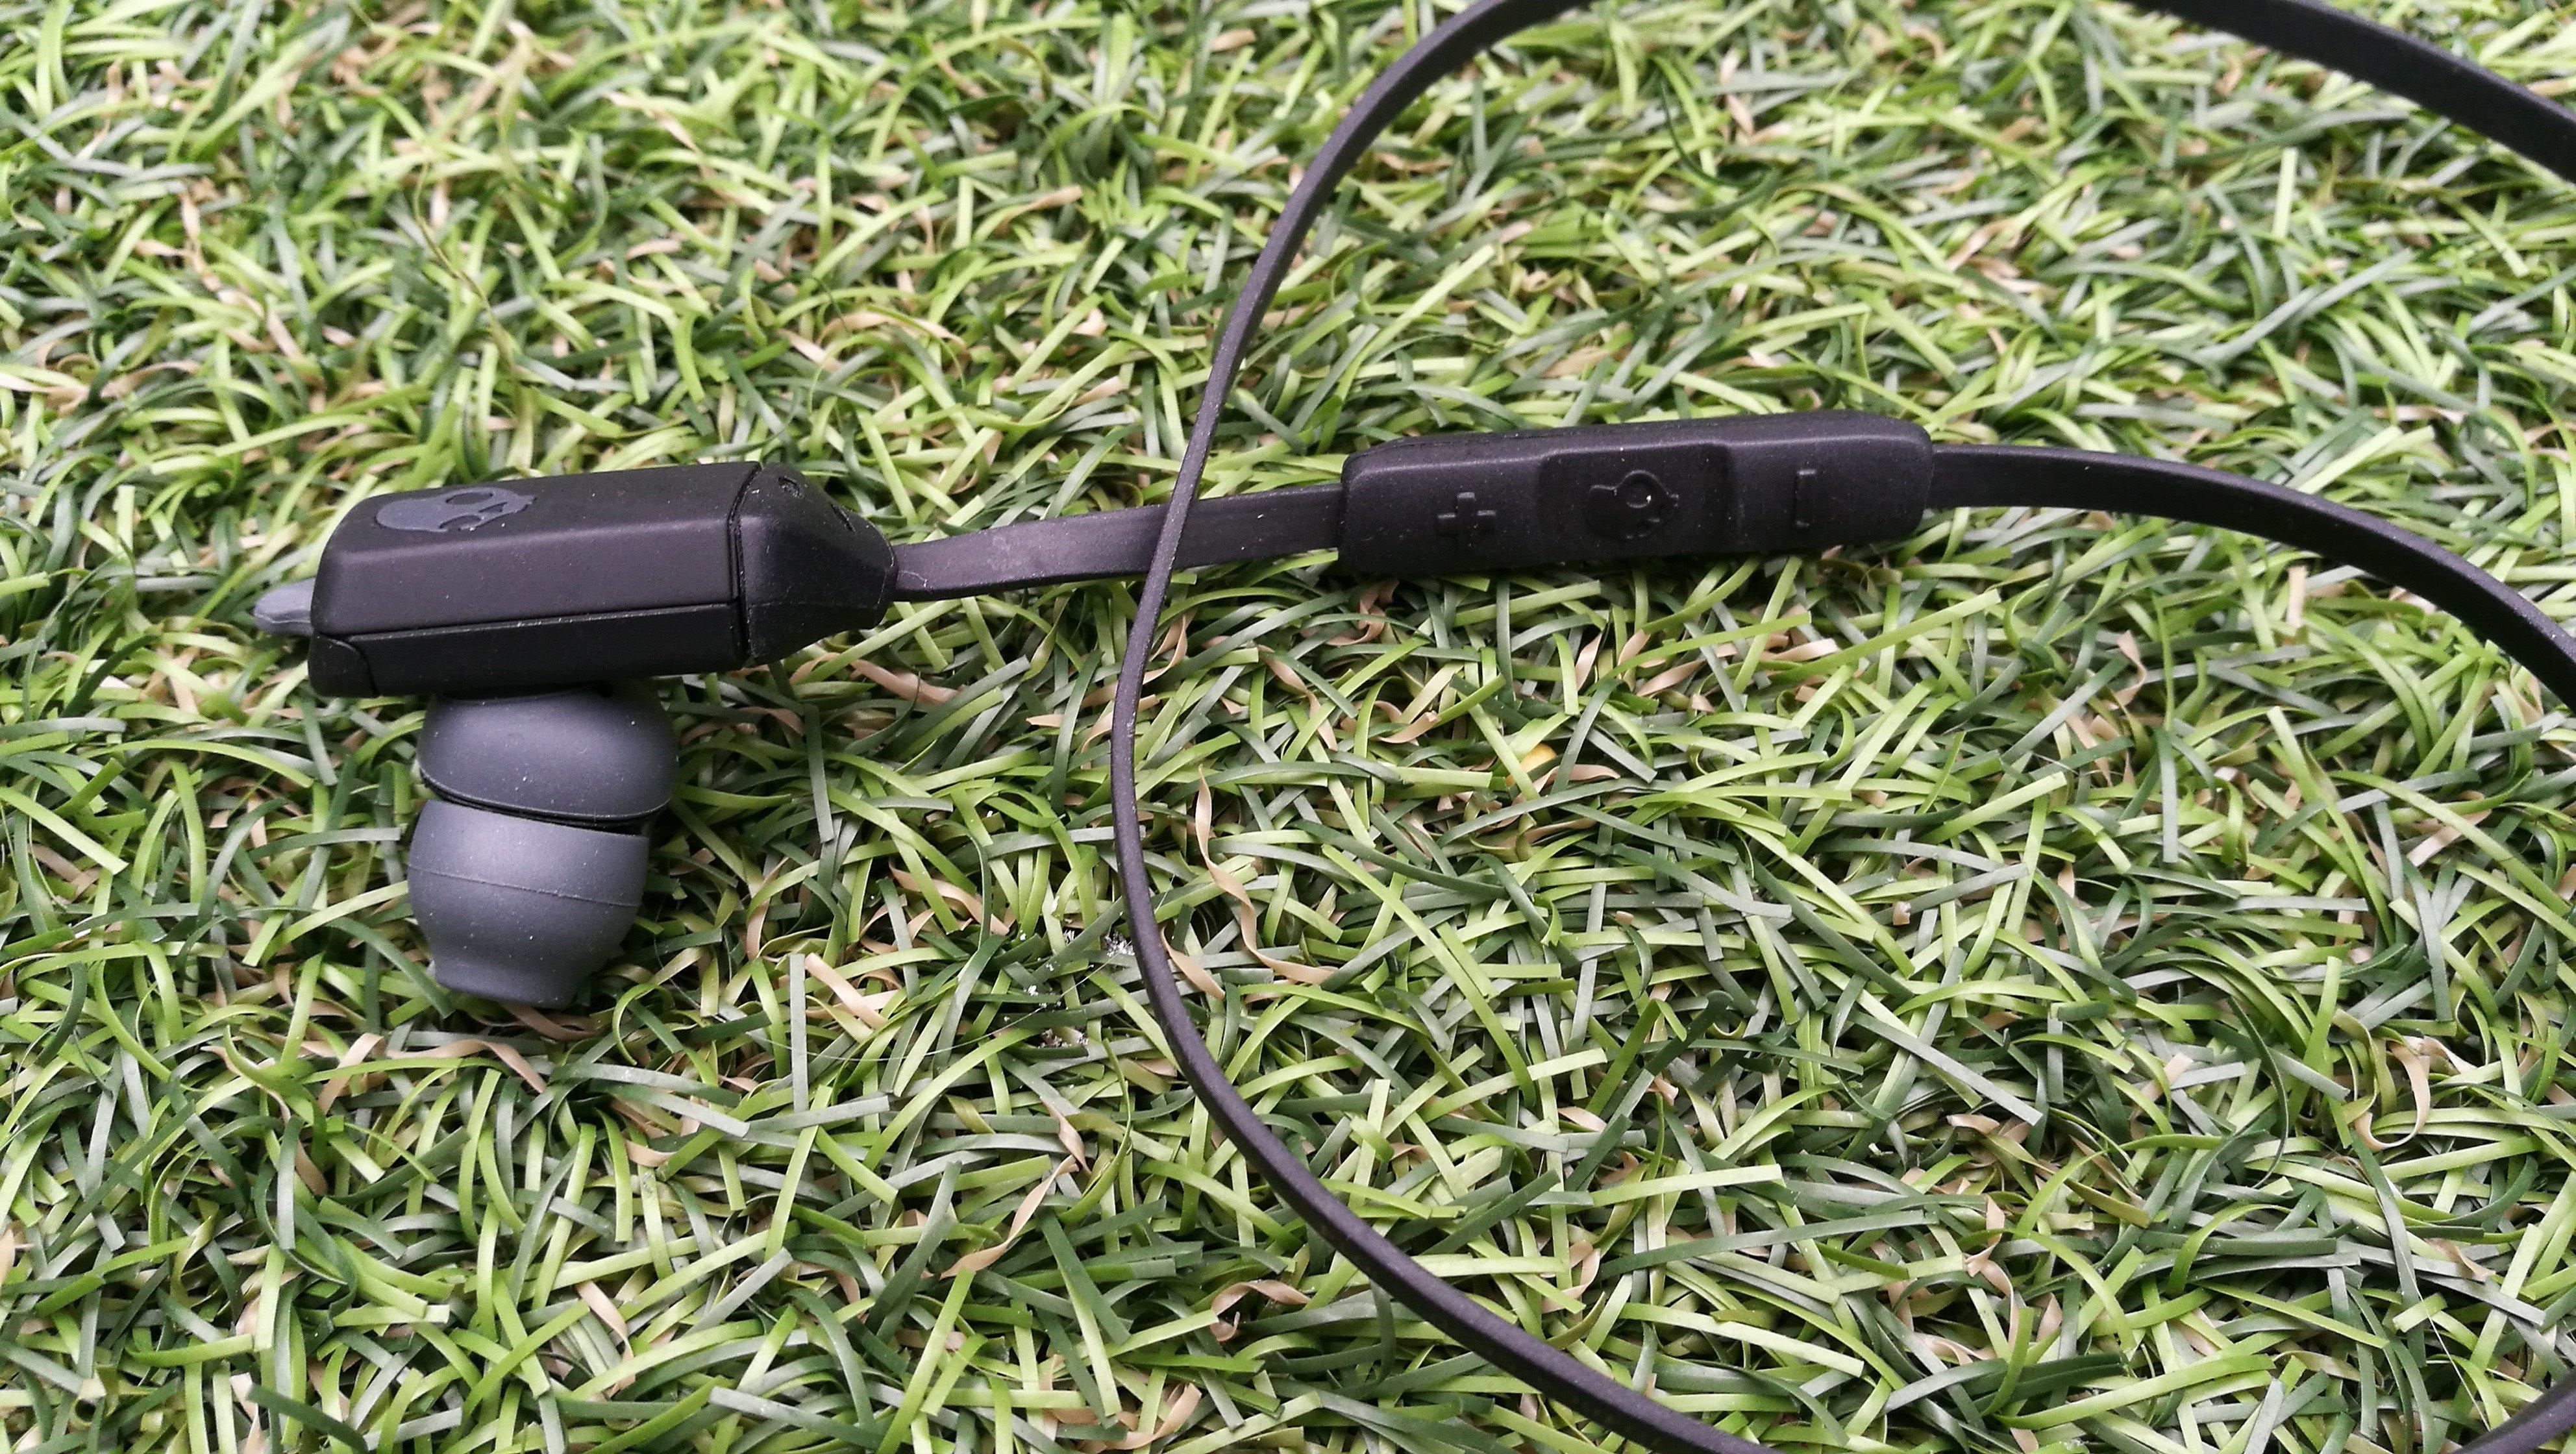 4b3e0945985 Skullcandy XTfree review - superb fit but spotty wireless | Expert Reviews